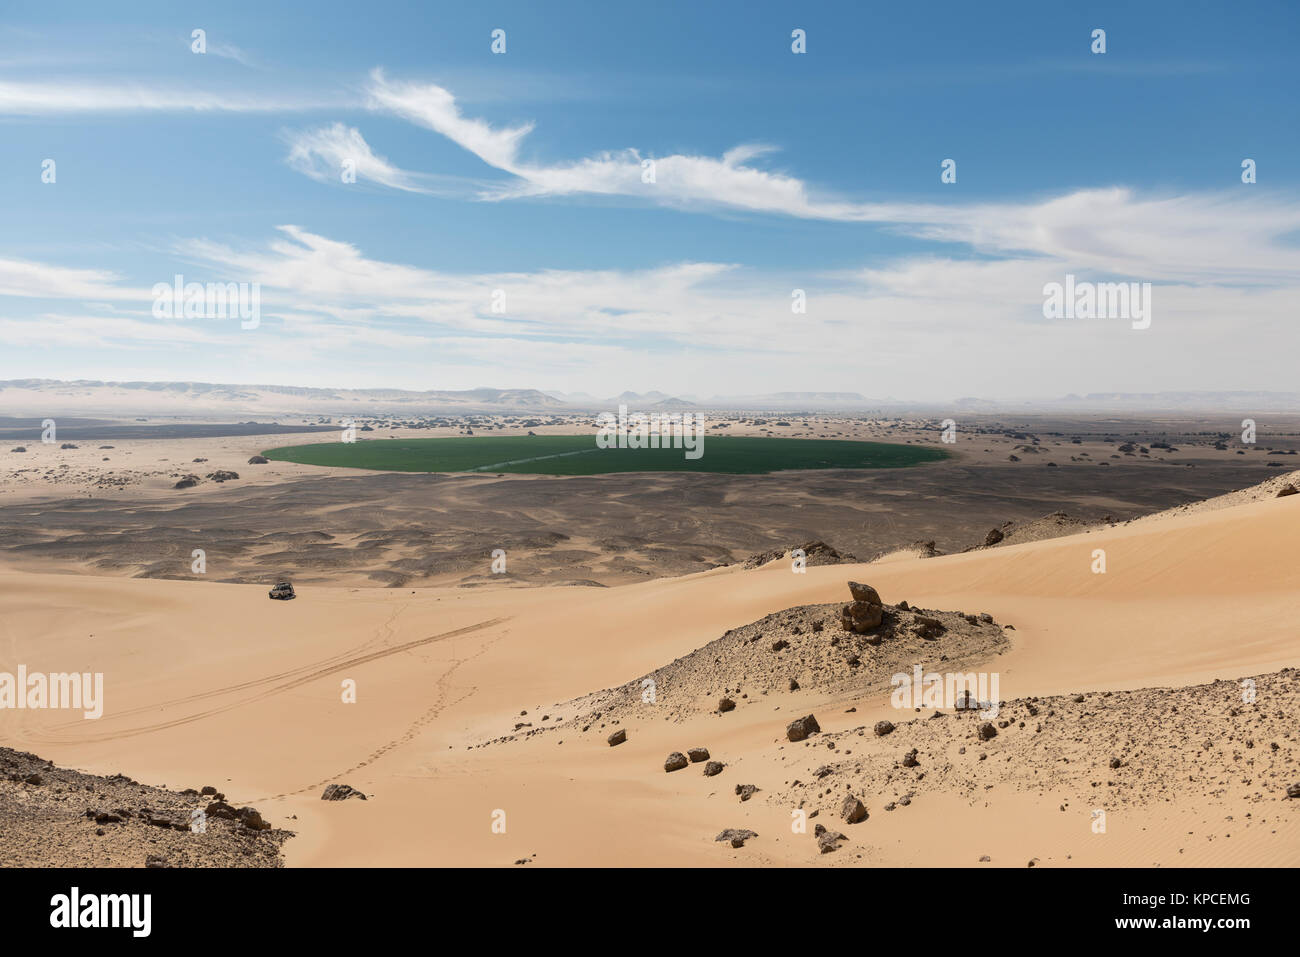 Organic farming in the Western desert near Baharia Oasis - Stock Image